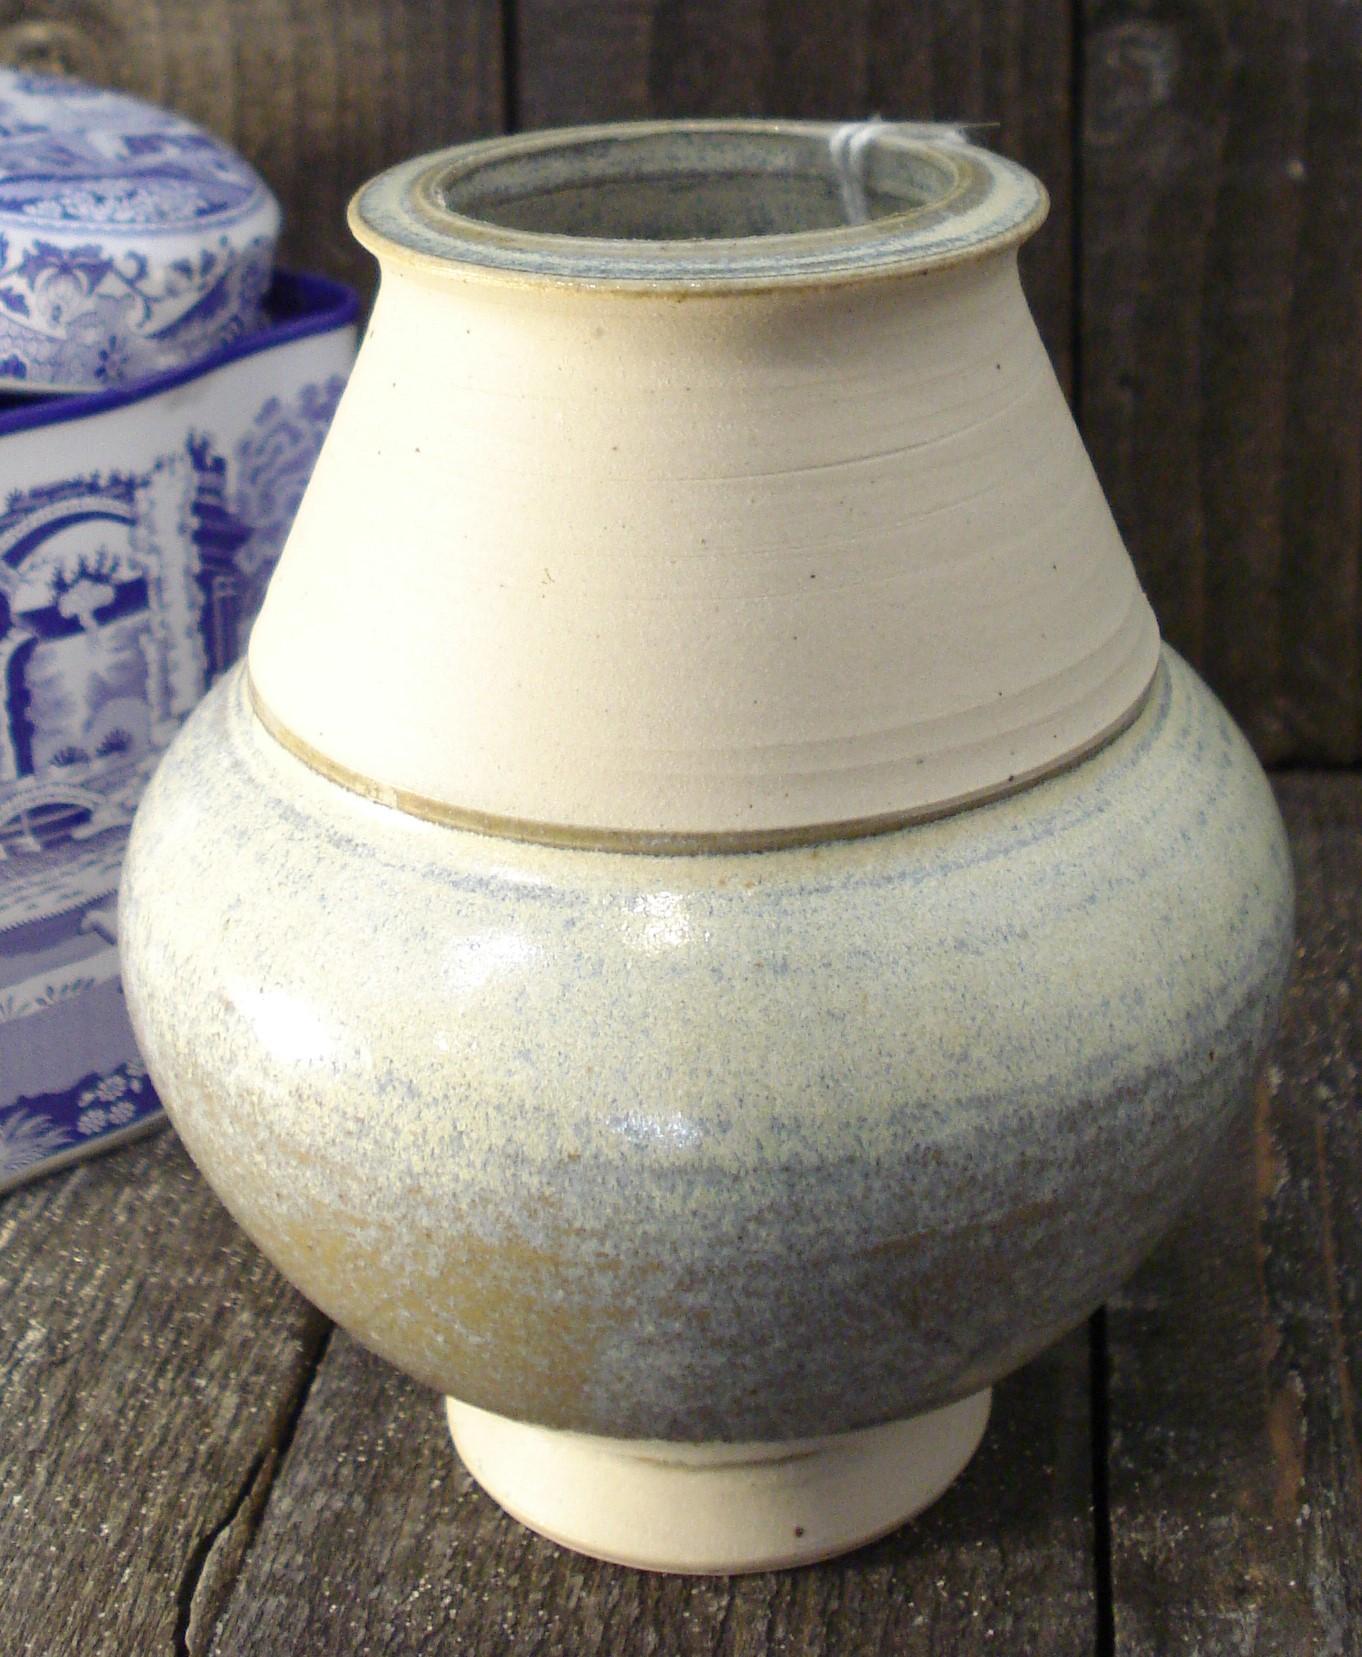 Blå/Oliven/Beige vaser fra Lars Kähler